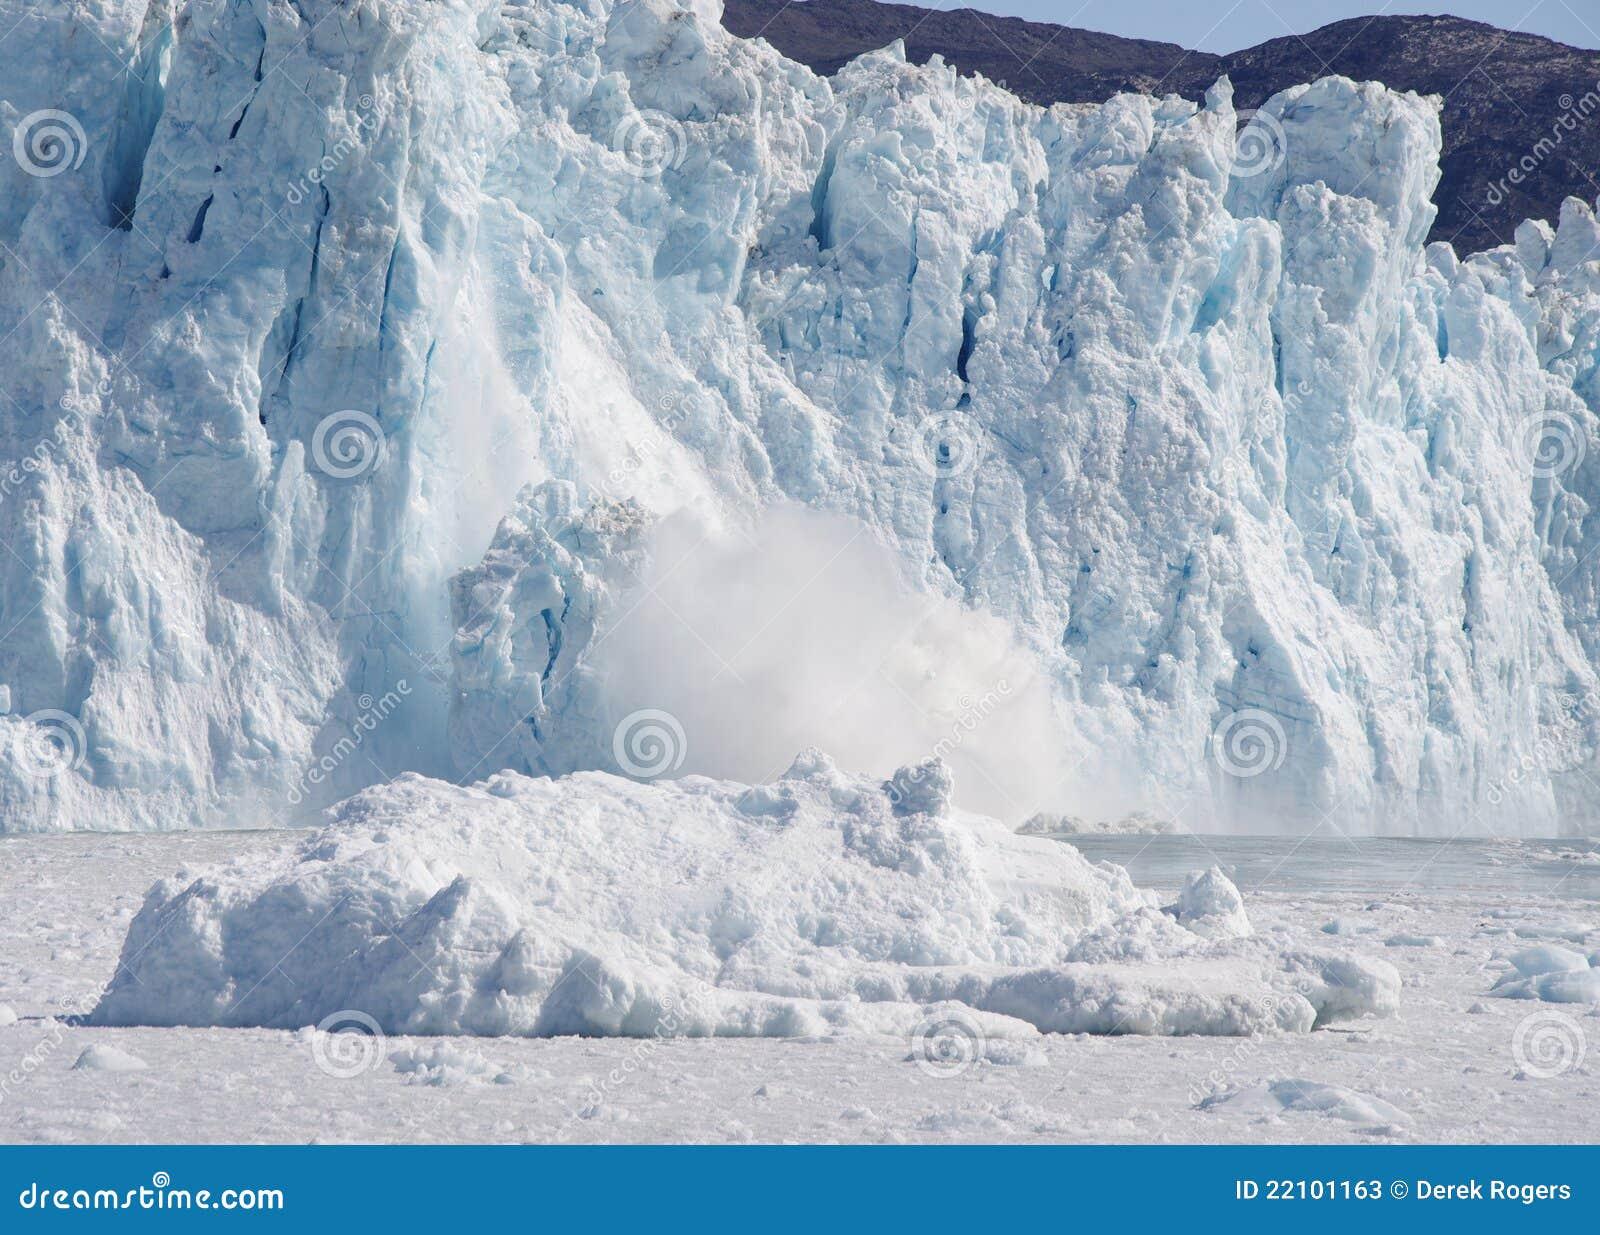 De Gletsjer die van Eqi, Groenland kalft